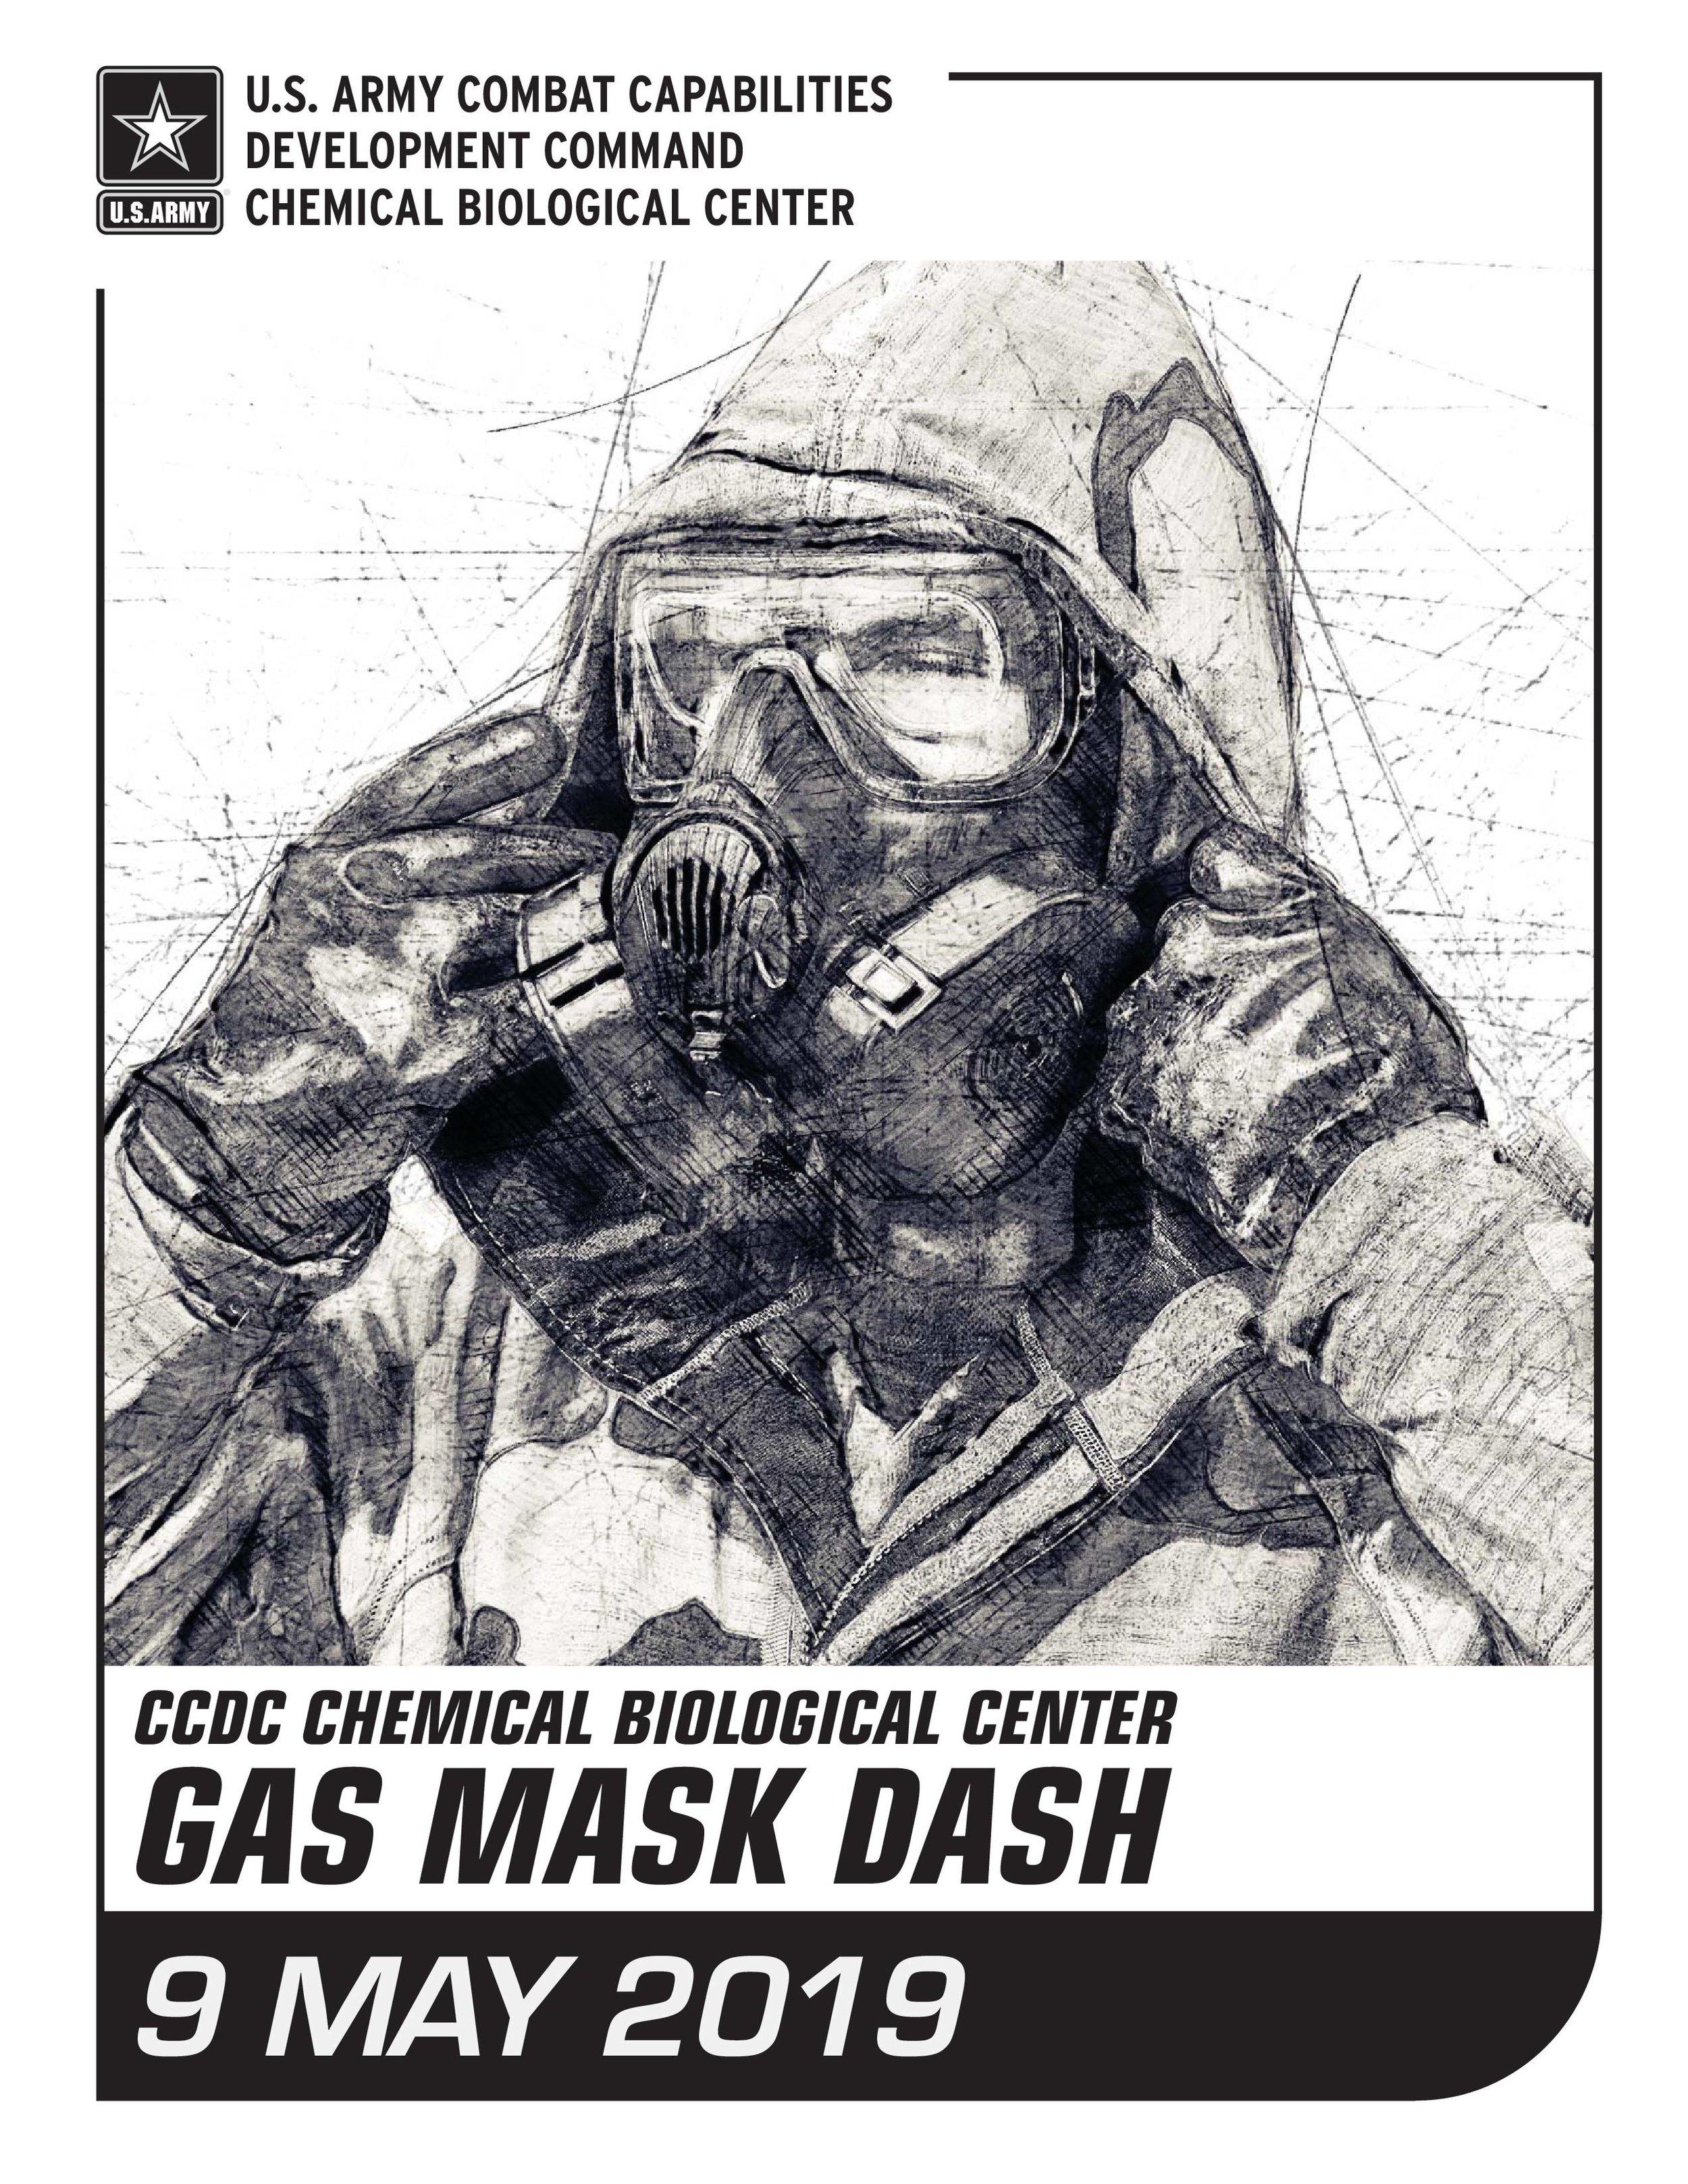 CCDC Chemical Biological Center Gas Mask Dash — Charm City Run